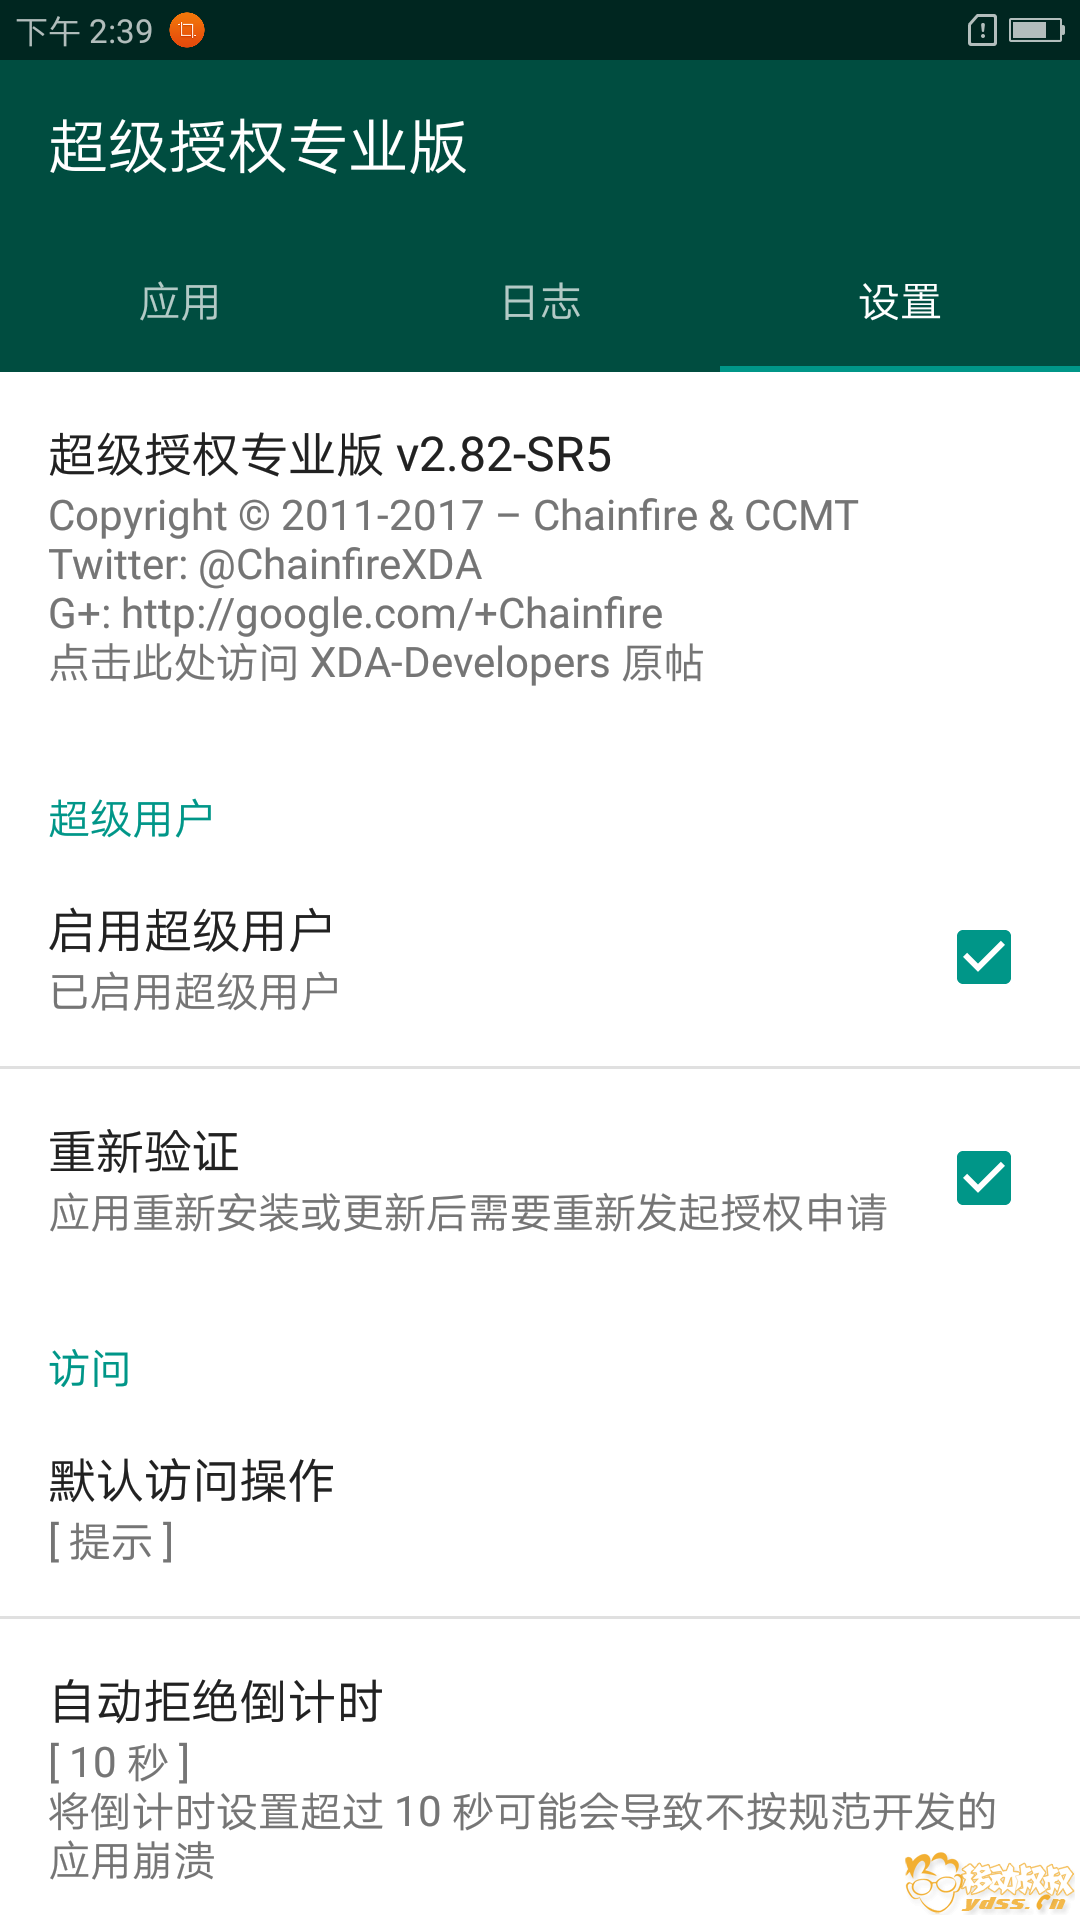 Screenshot_2018-05-17-14-39-08-0629309984.png